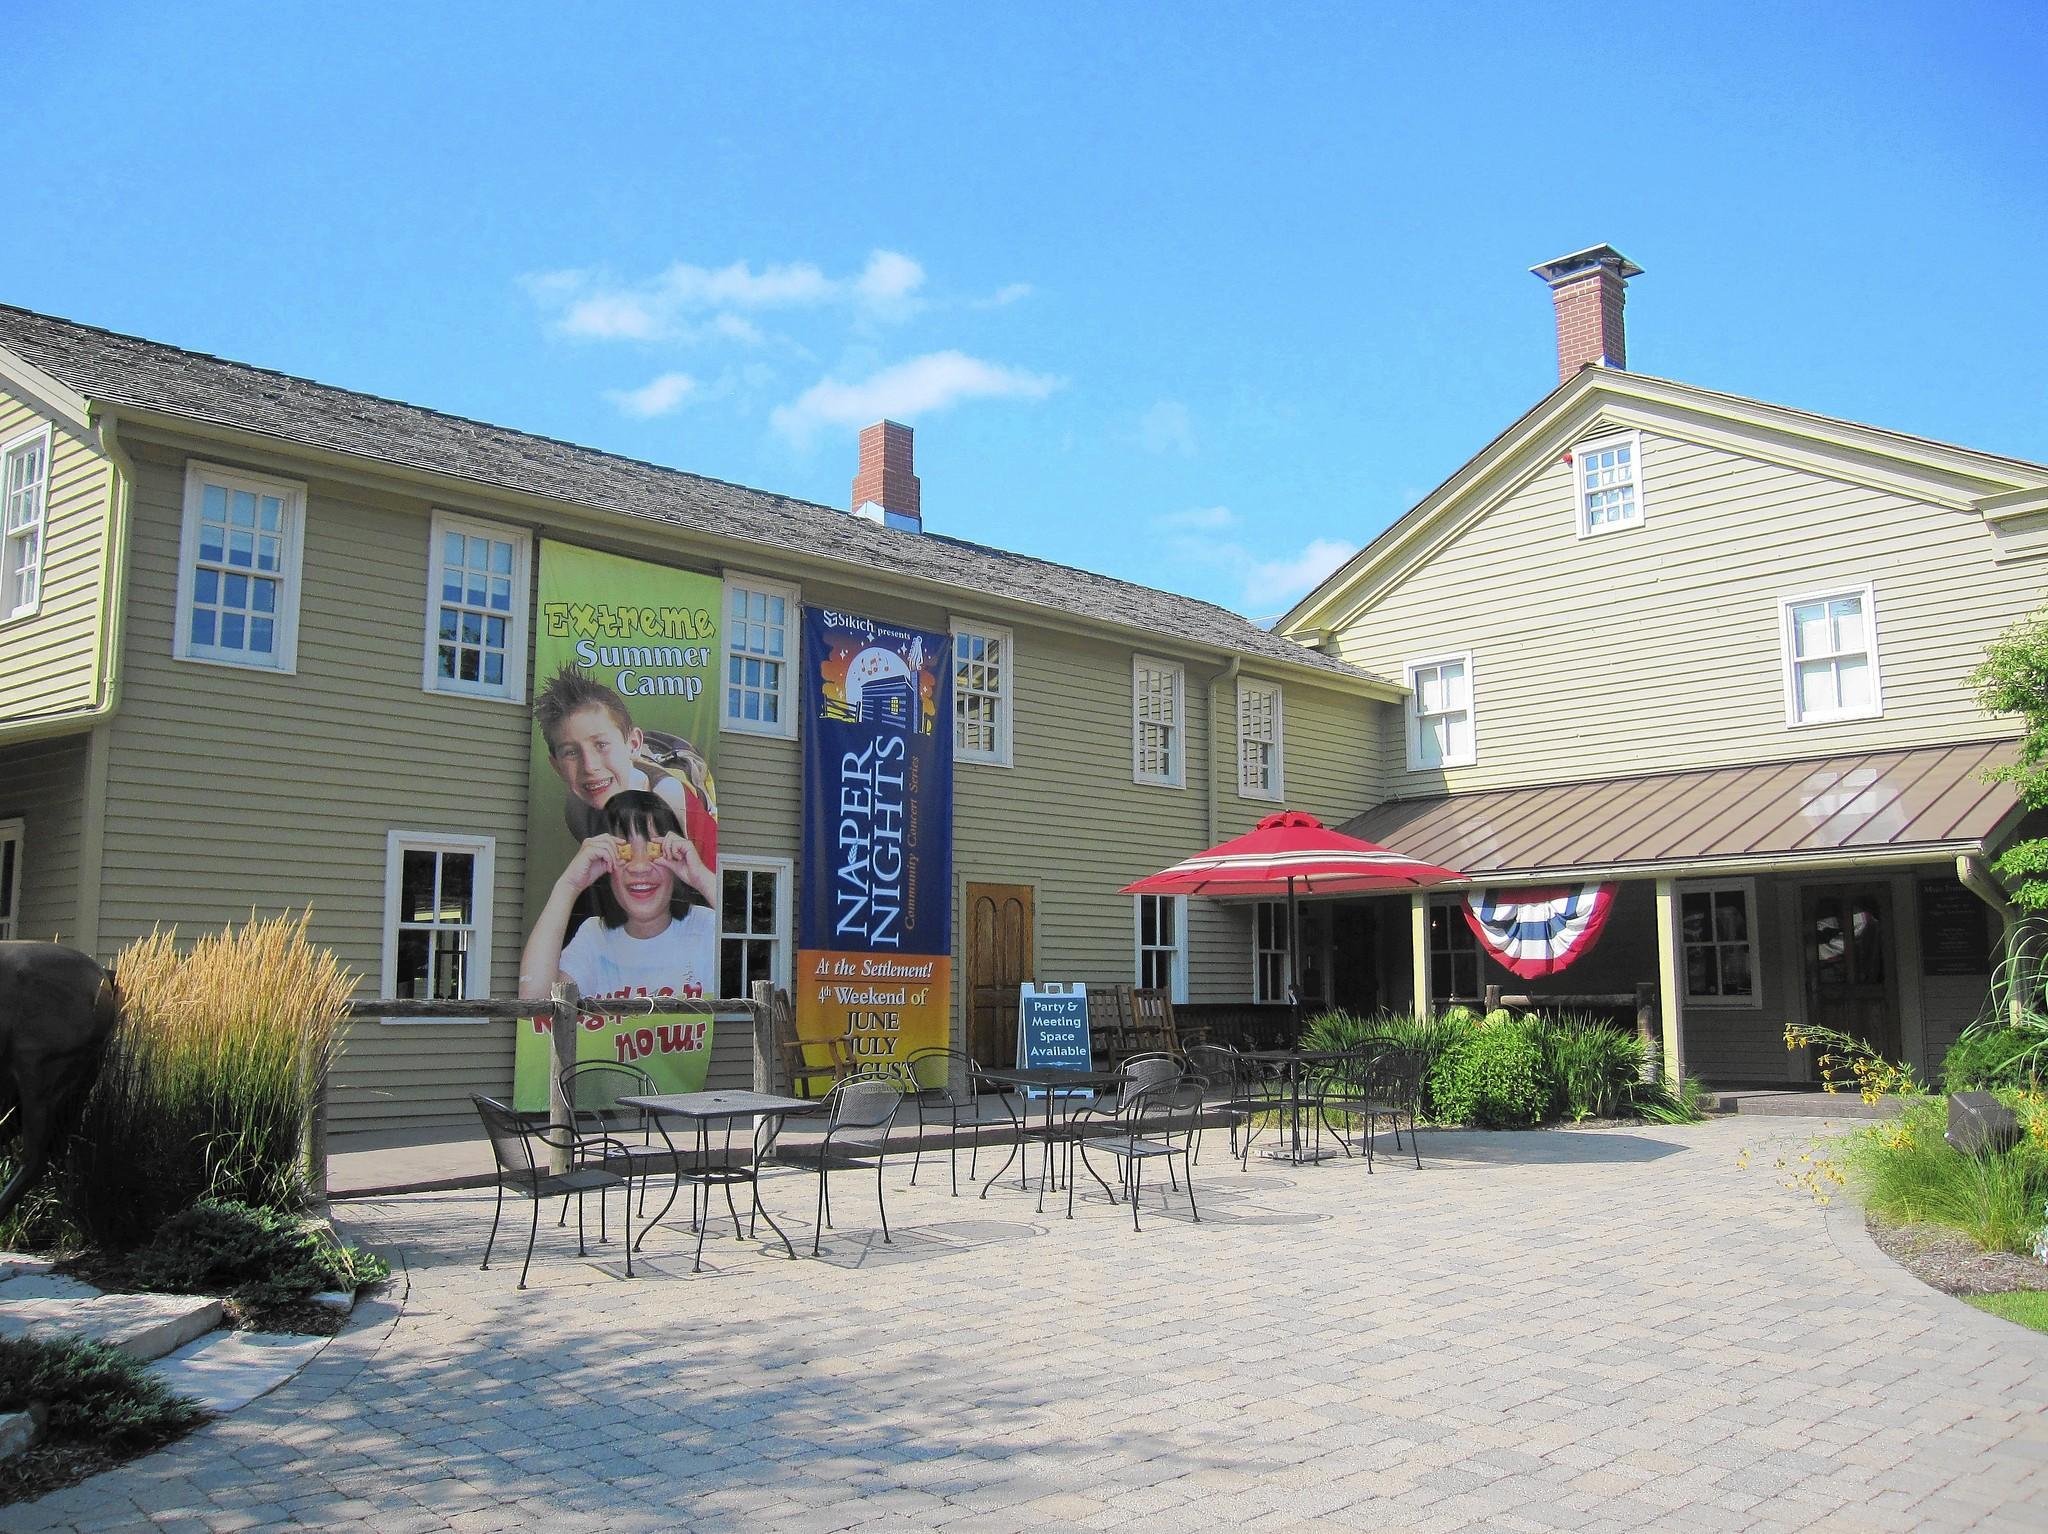 Naper Settelment living history museum plans to create an agricultural interpretive center.